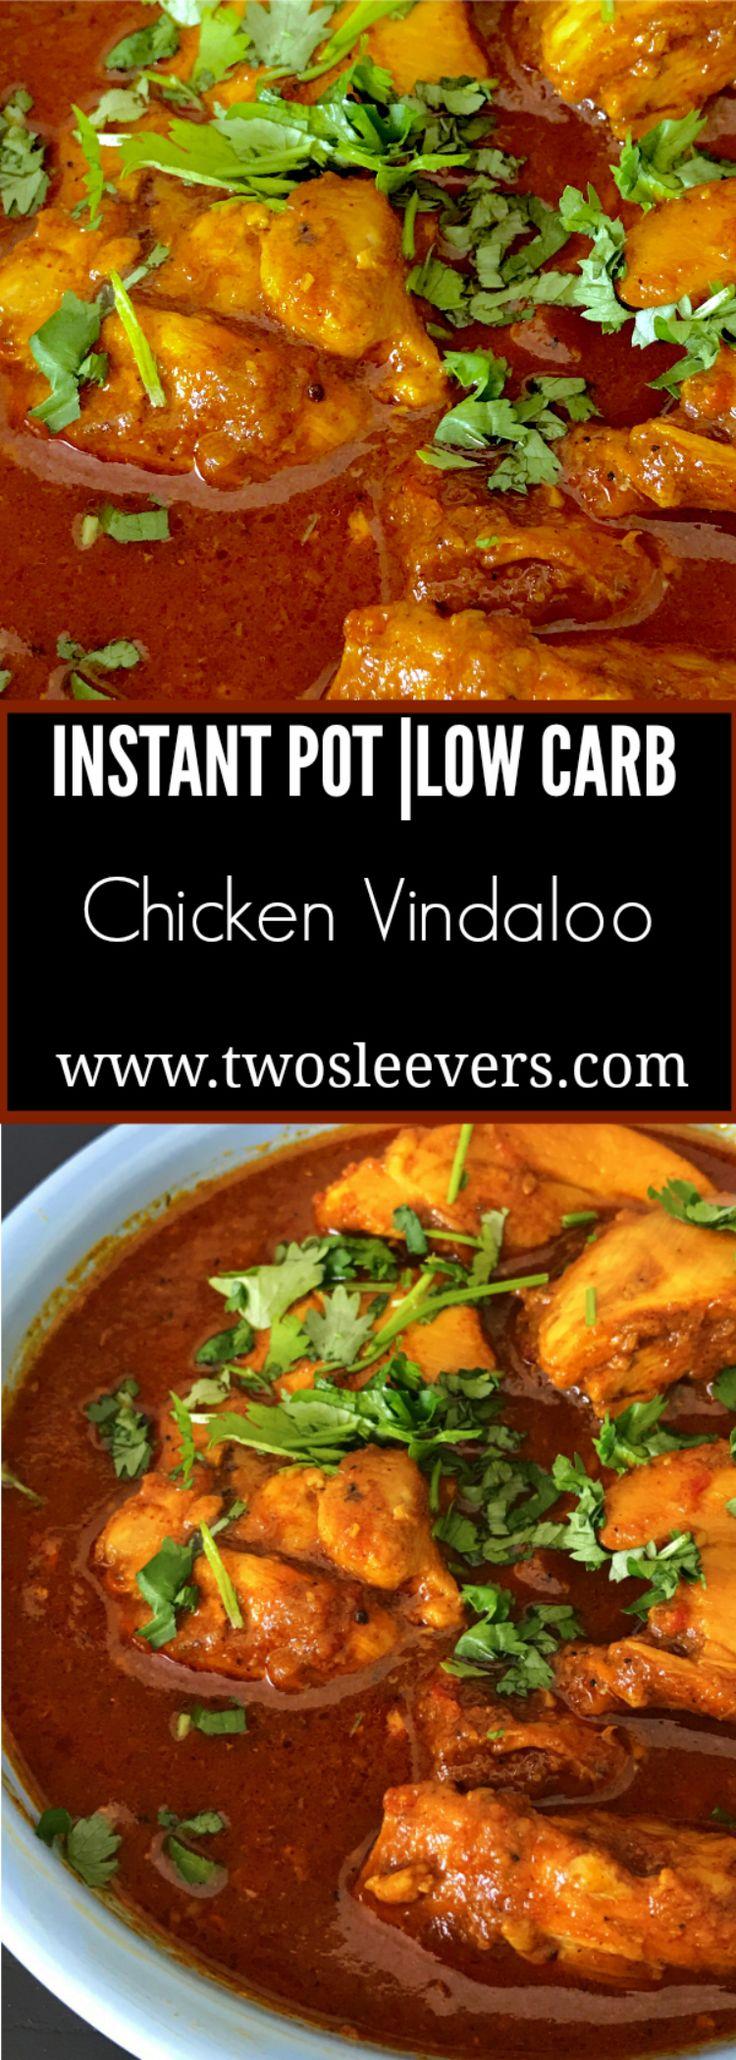 Chicken Vindaloo Pinterest - Instant Pot Low Carb Chicken Vindaloo - https://twosleevers.com